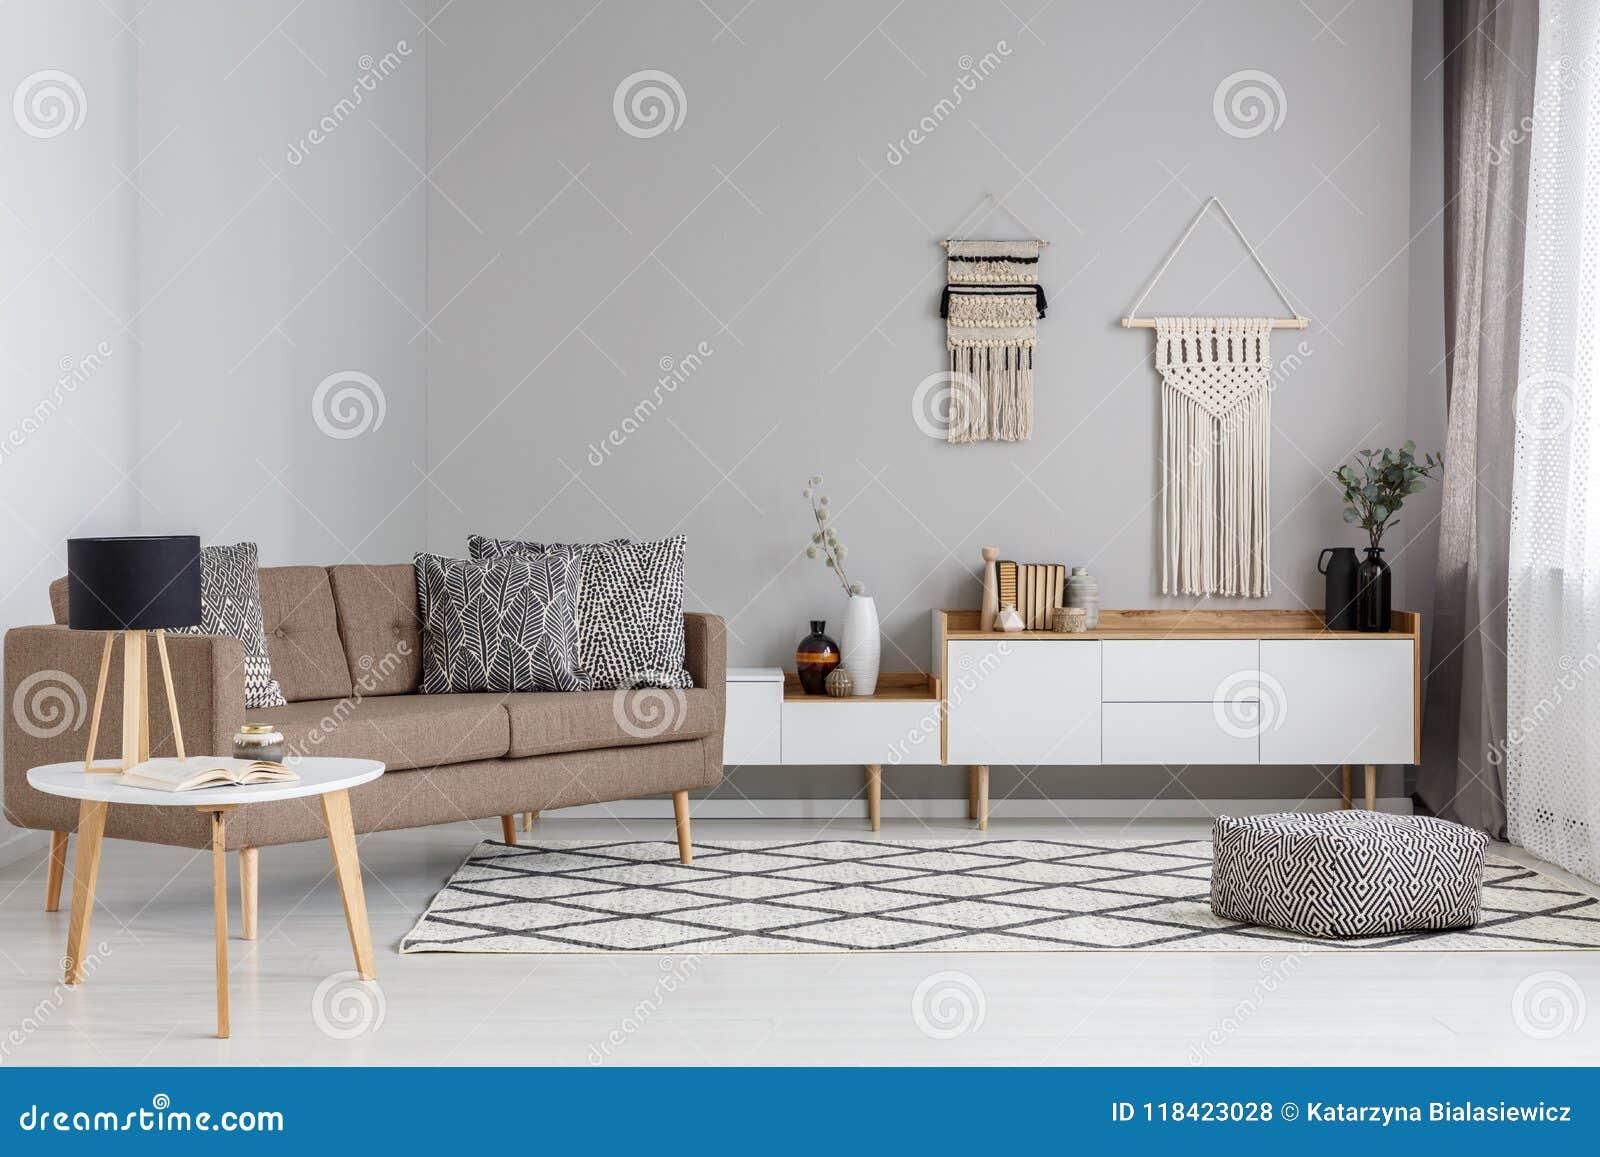 Patterned pouf on carpet near brown sofa in modern living room i